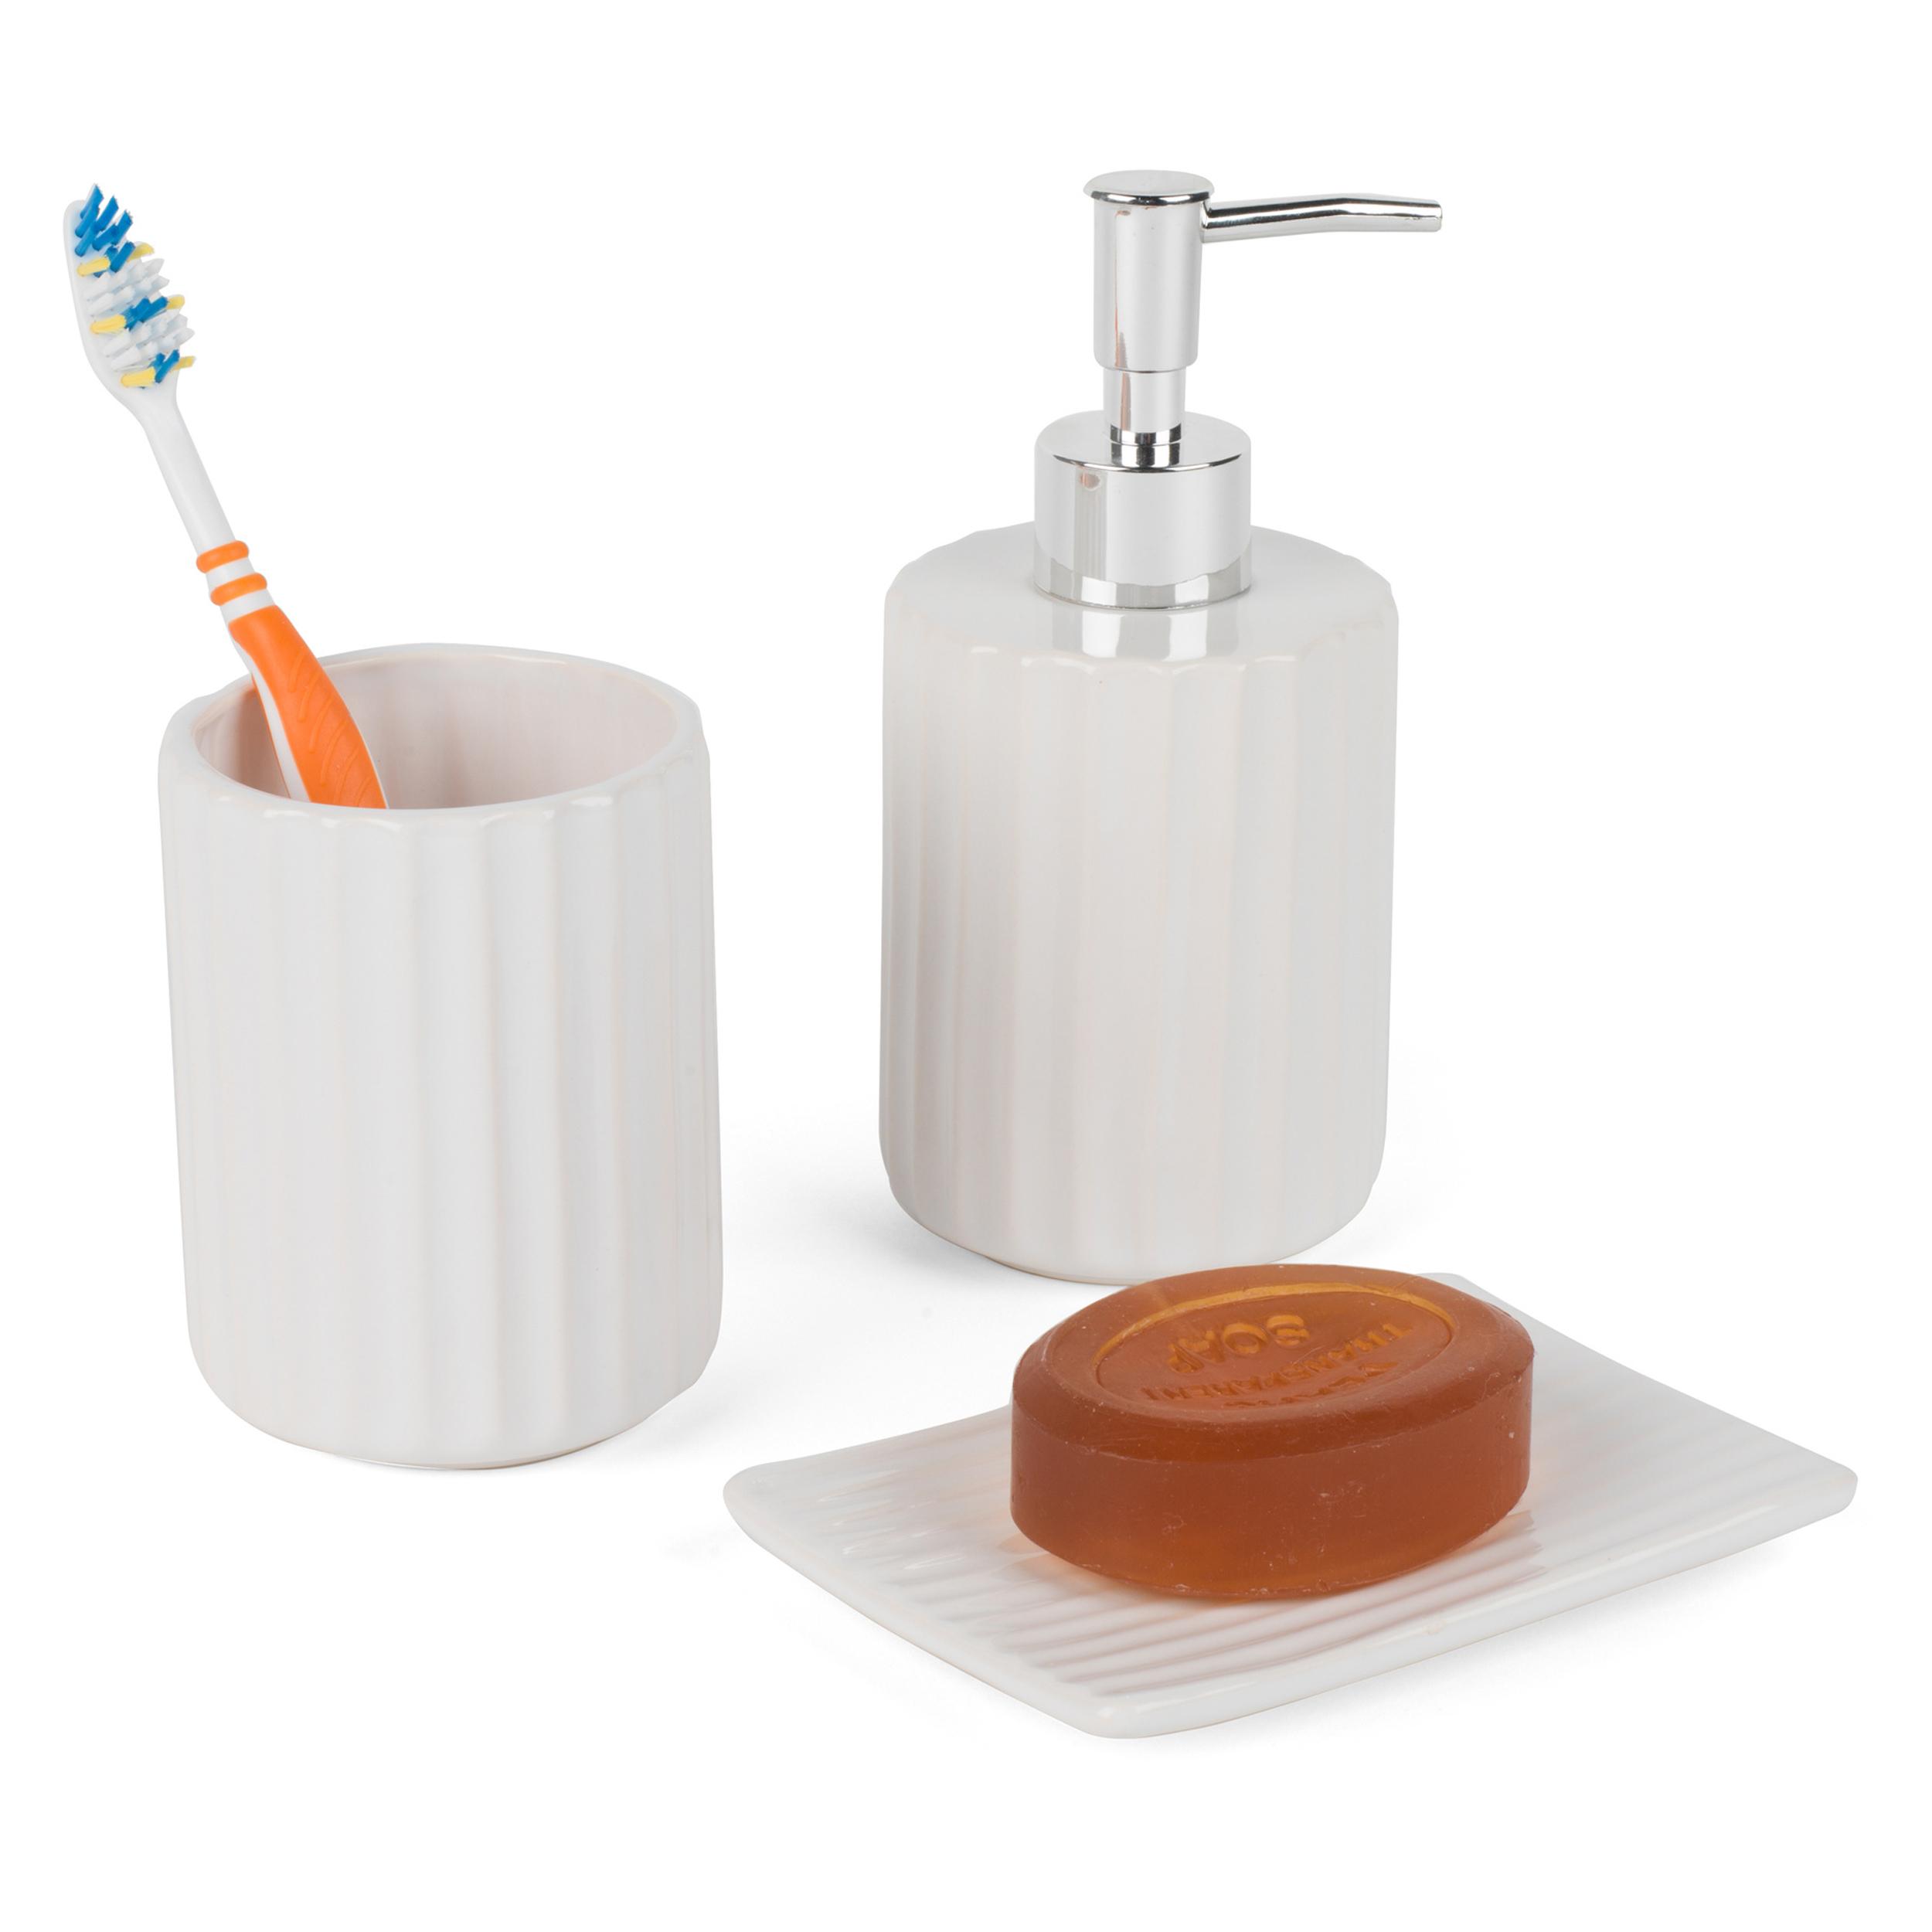 Beldray Ceramic Dolomite Set With Toothbrush Holder Hand